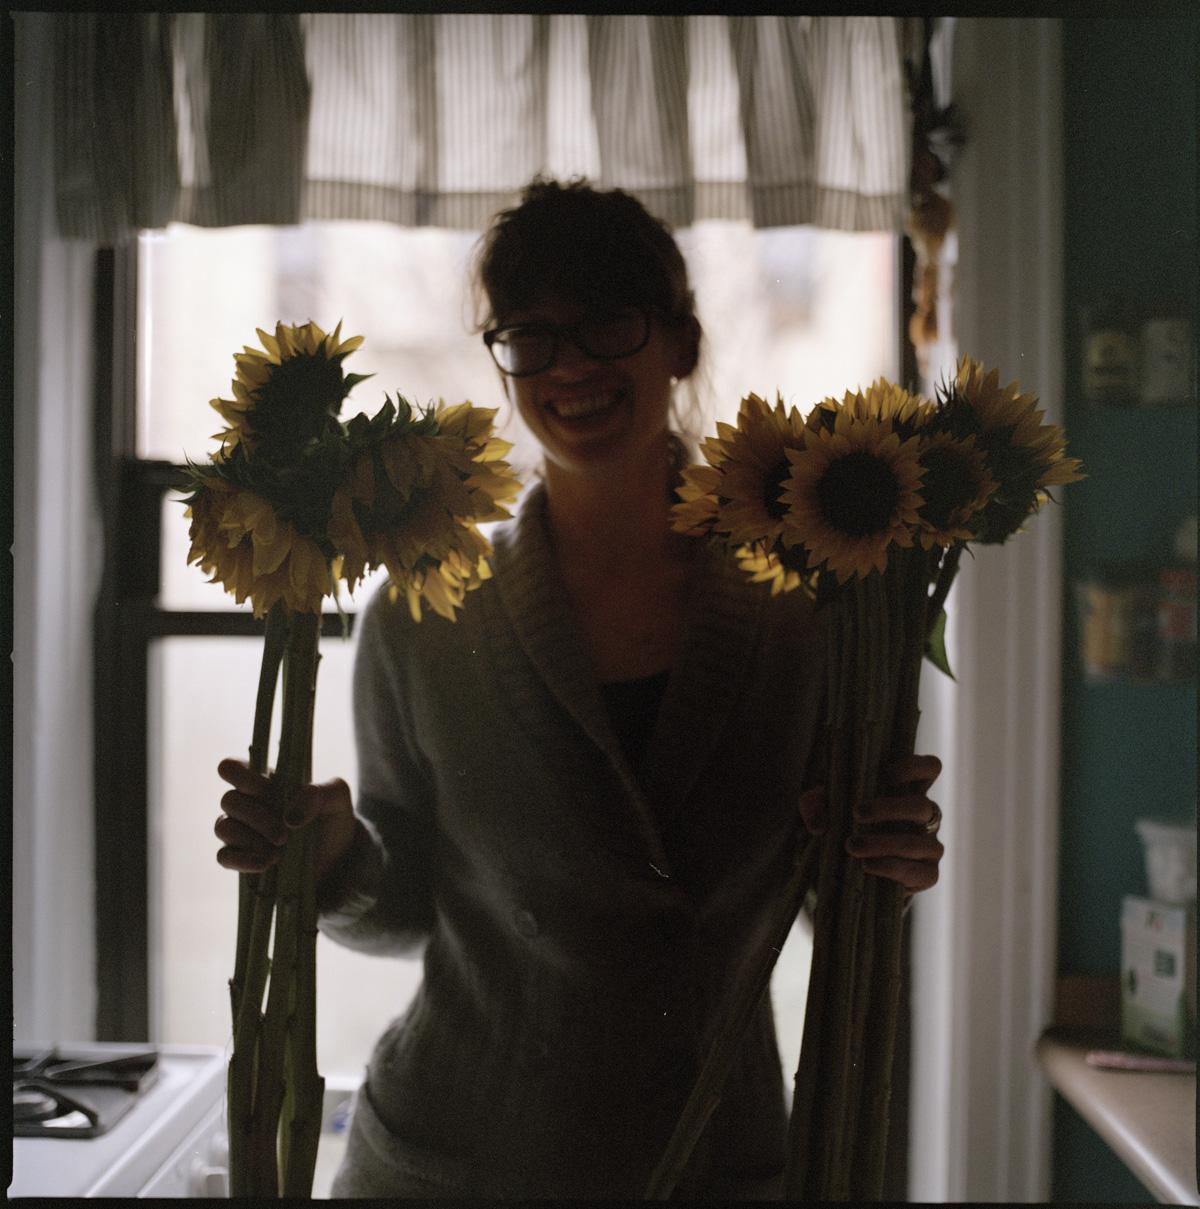 sunflowers_001.01.jpg